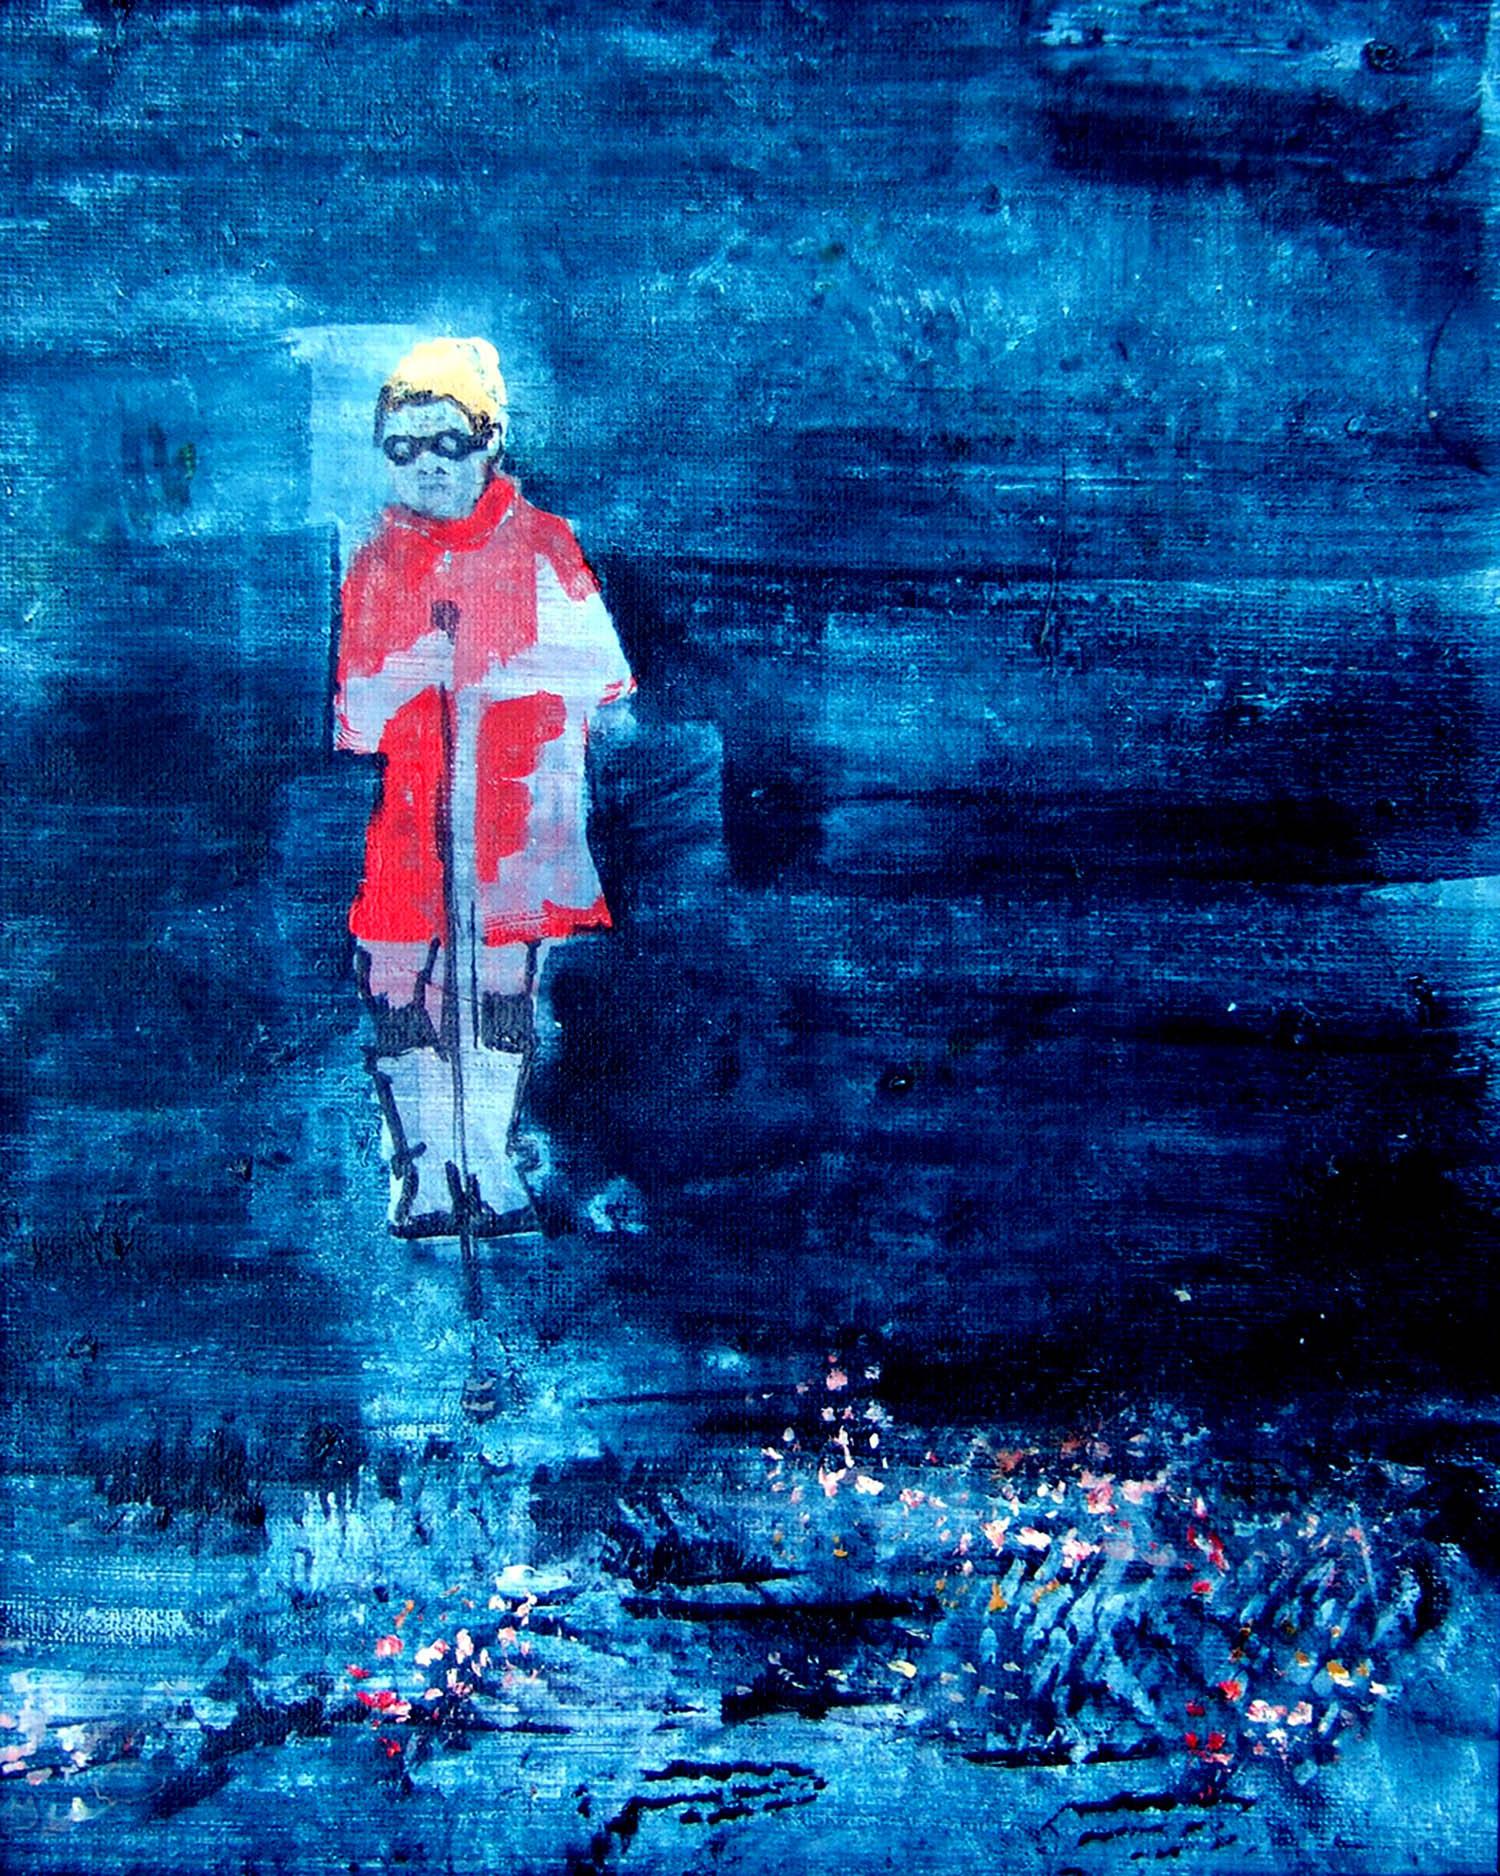 Bop Bop Bandit (2010), acrylic on canvas, 25.4 x 20.3cm